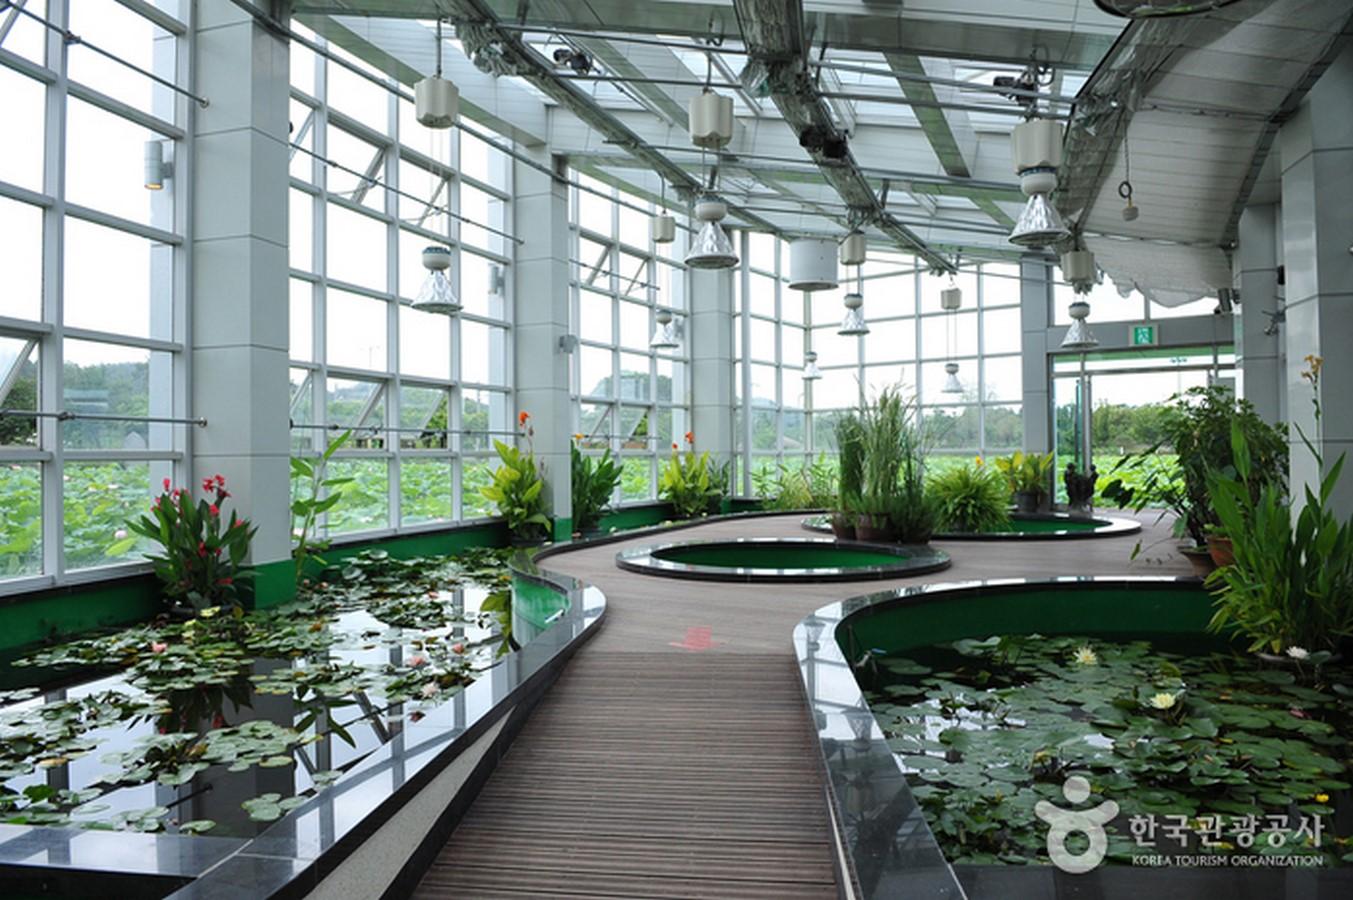 Hoesan White Lotus Pond, Jeonranamdo - Sheet1